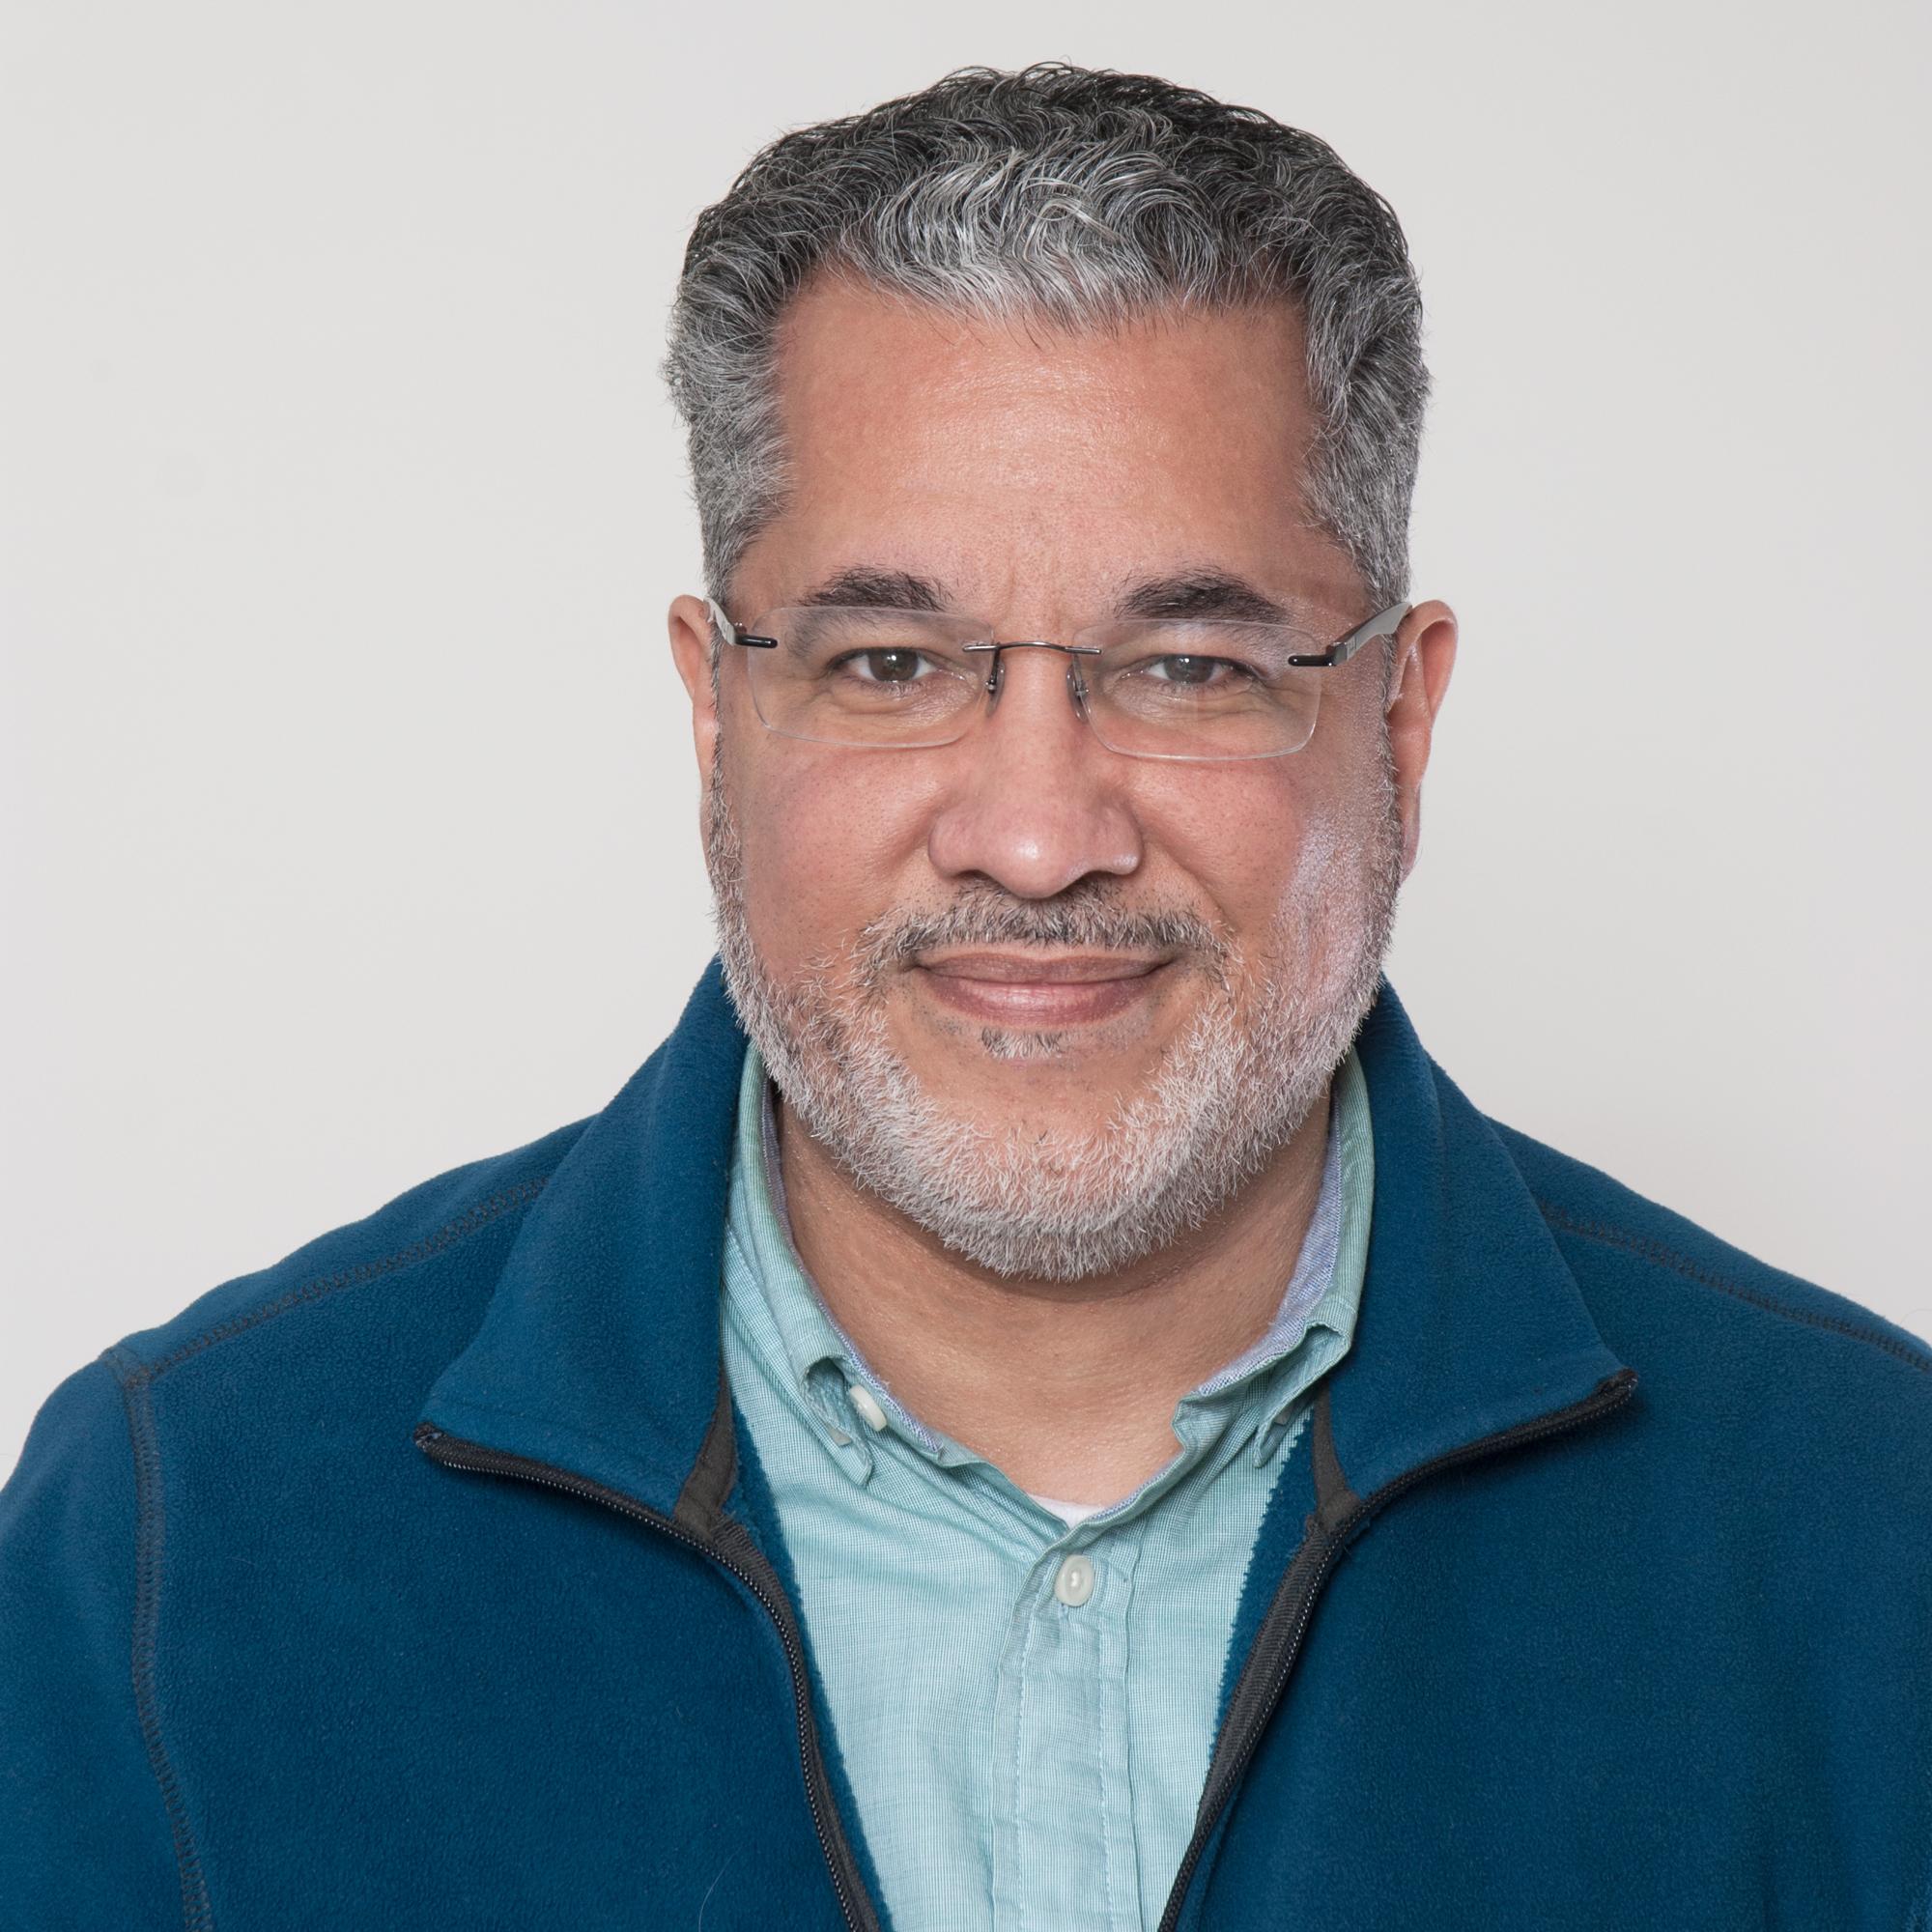 Edwin Pagán, Communications & Media Director